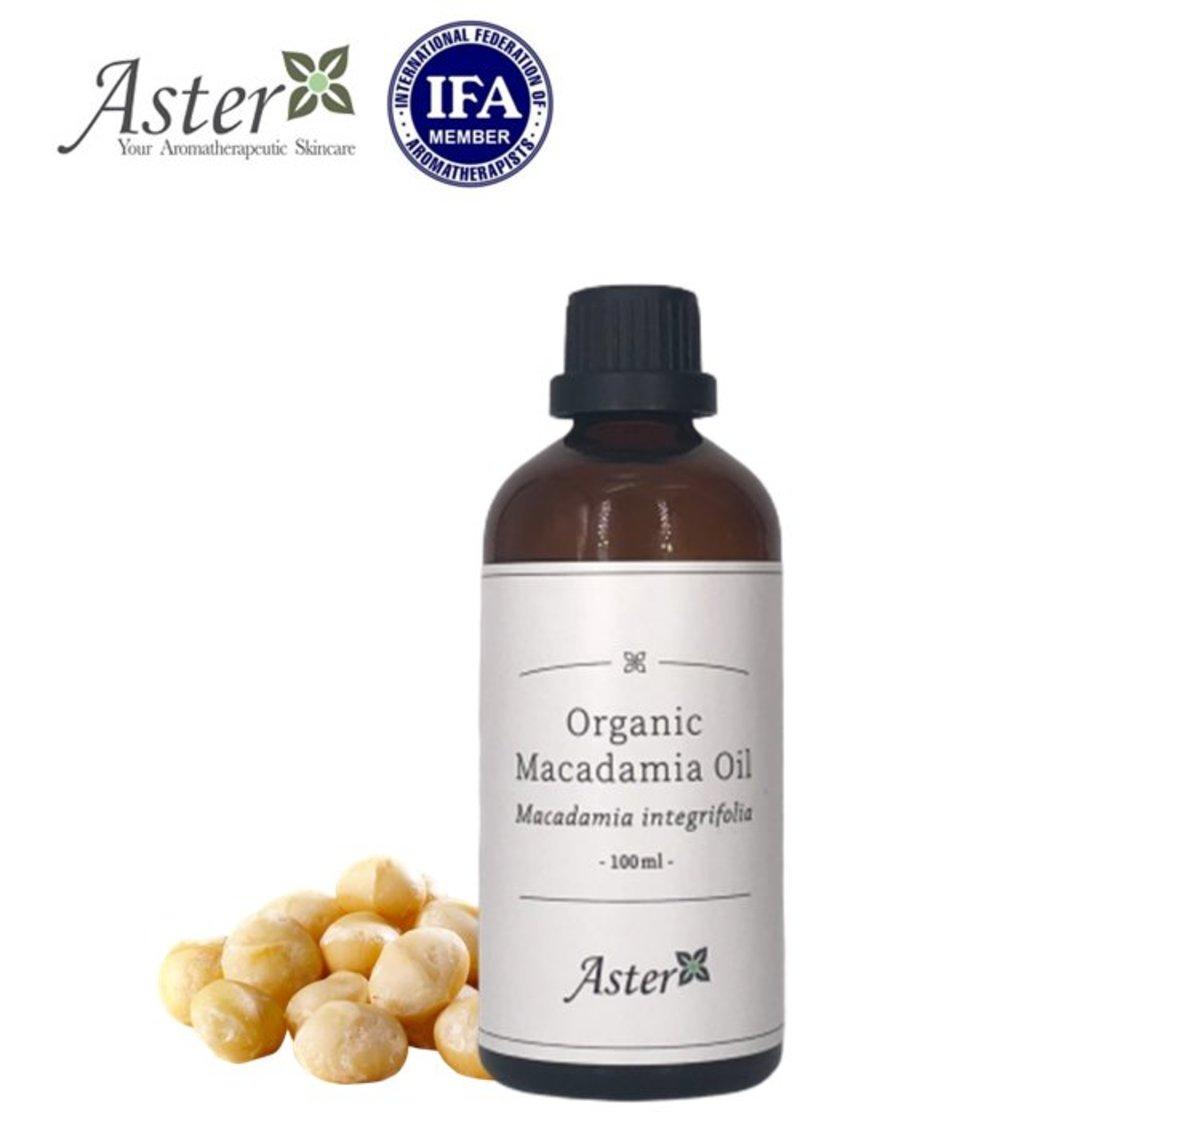 Organic Macadamia Oil (Macadamia integrifolia) - 50ml